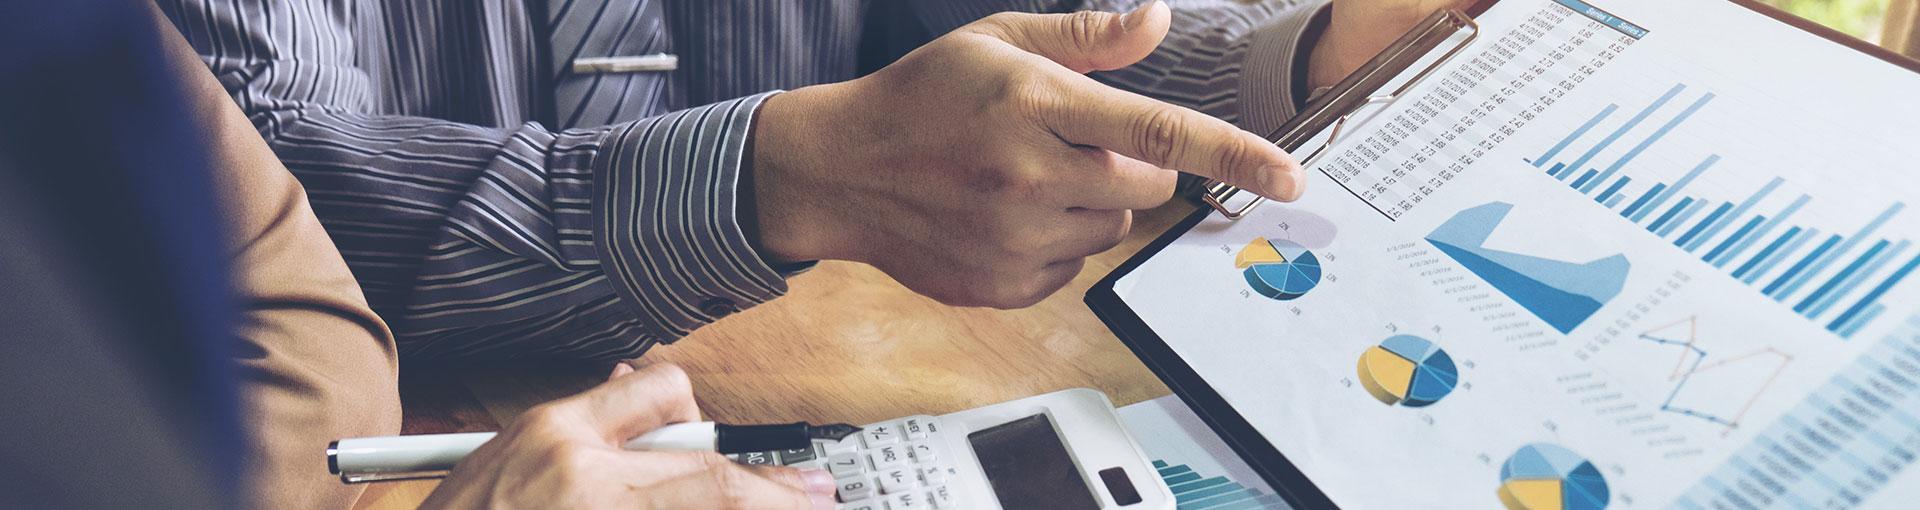 Why Should You Hire an SEO Company